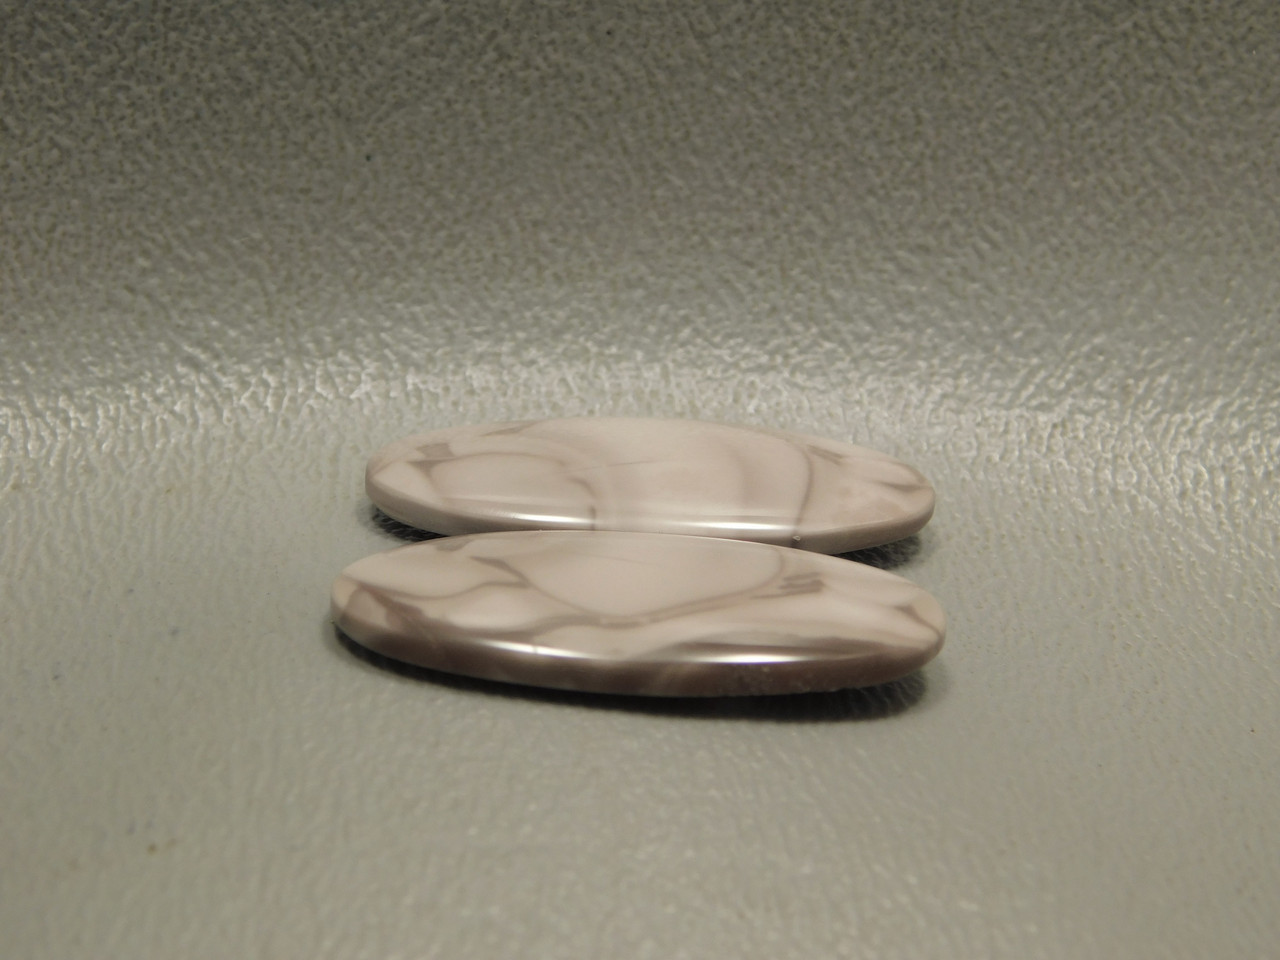 Willow Creek Porcelain Jasper Matched Pair Cabochons #14